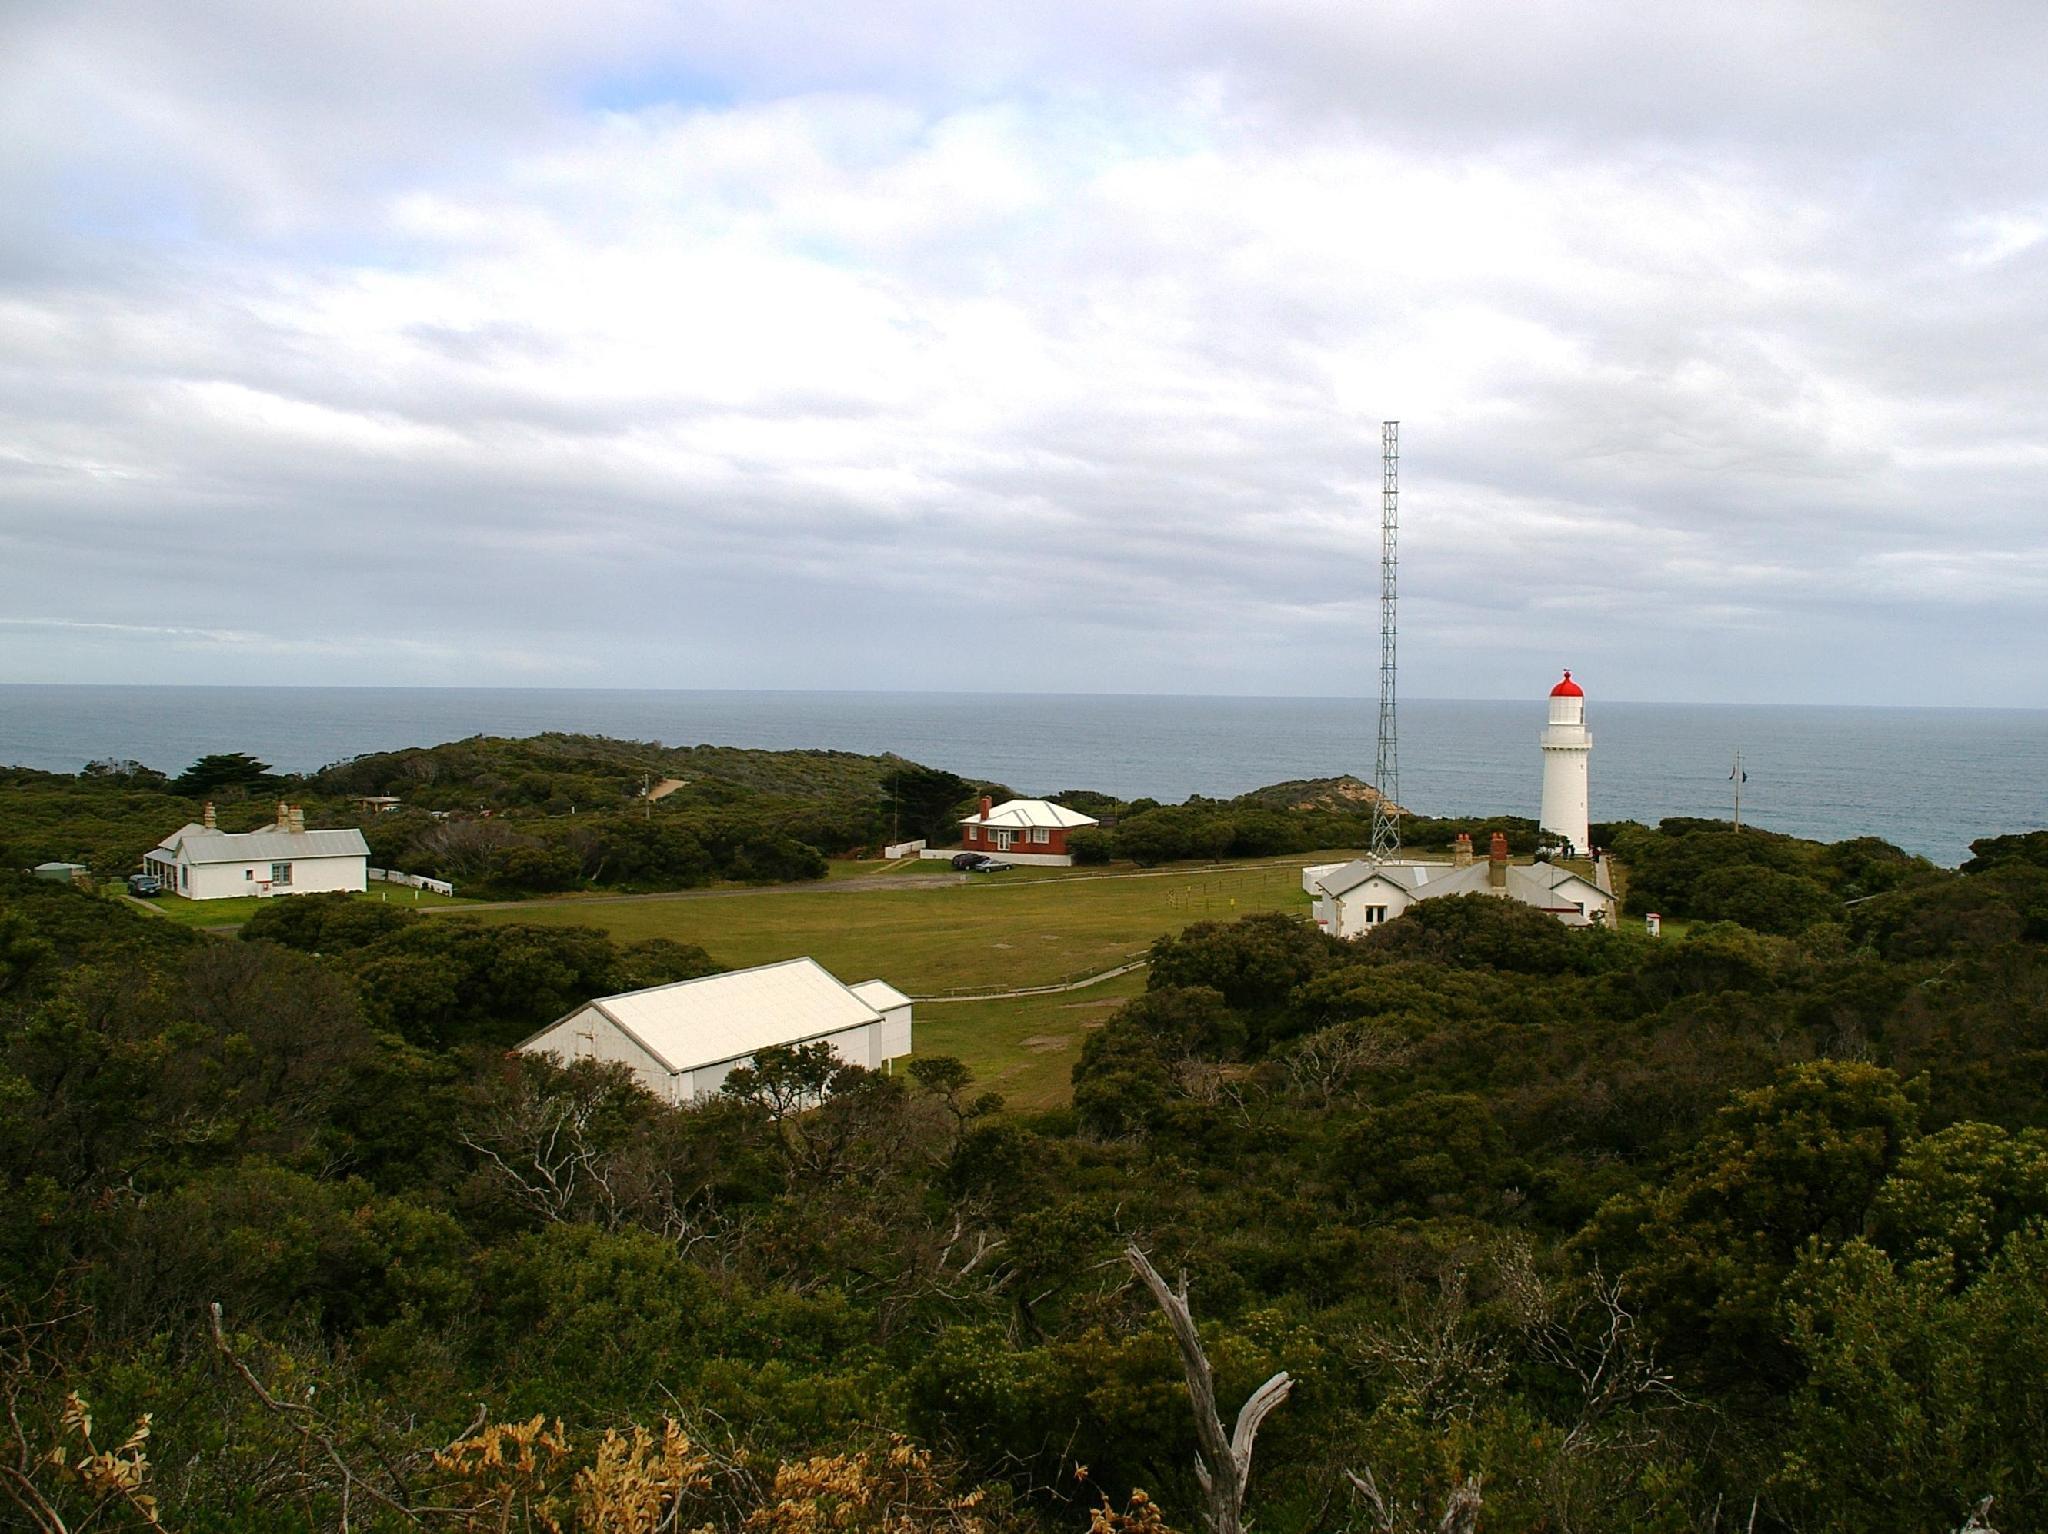 Cape Schanck Lightstation